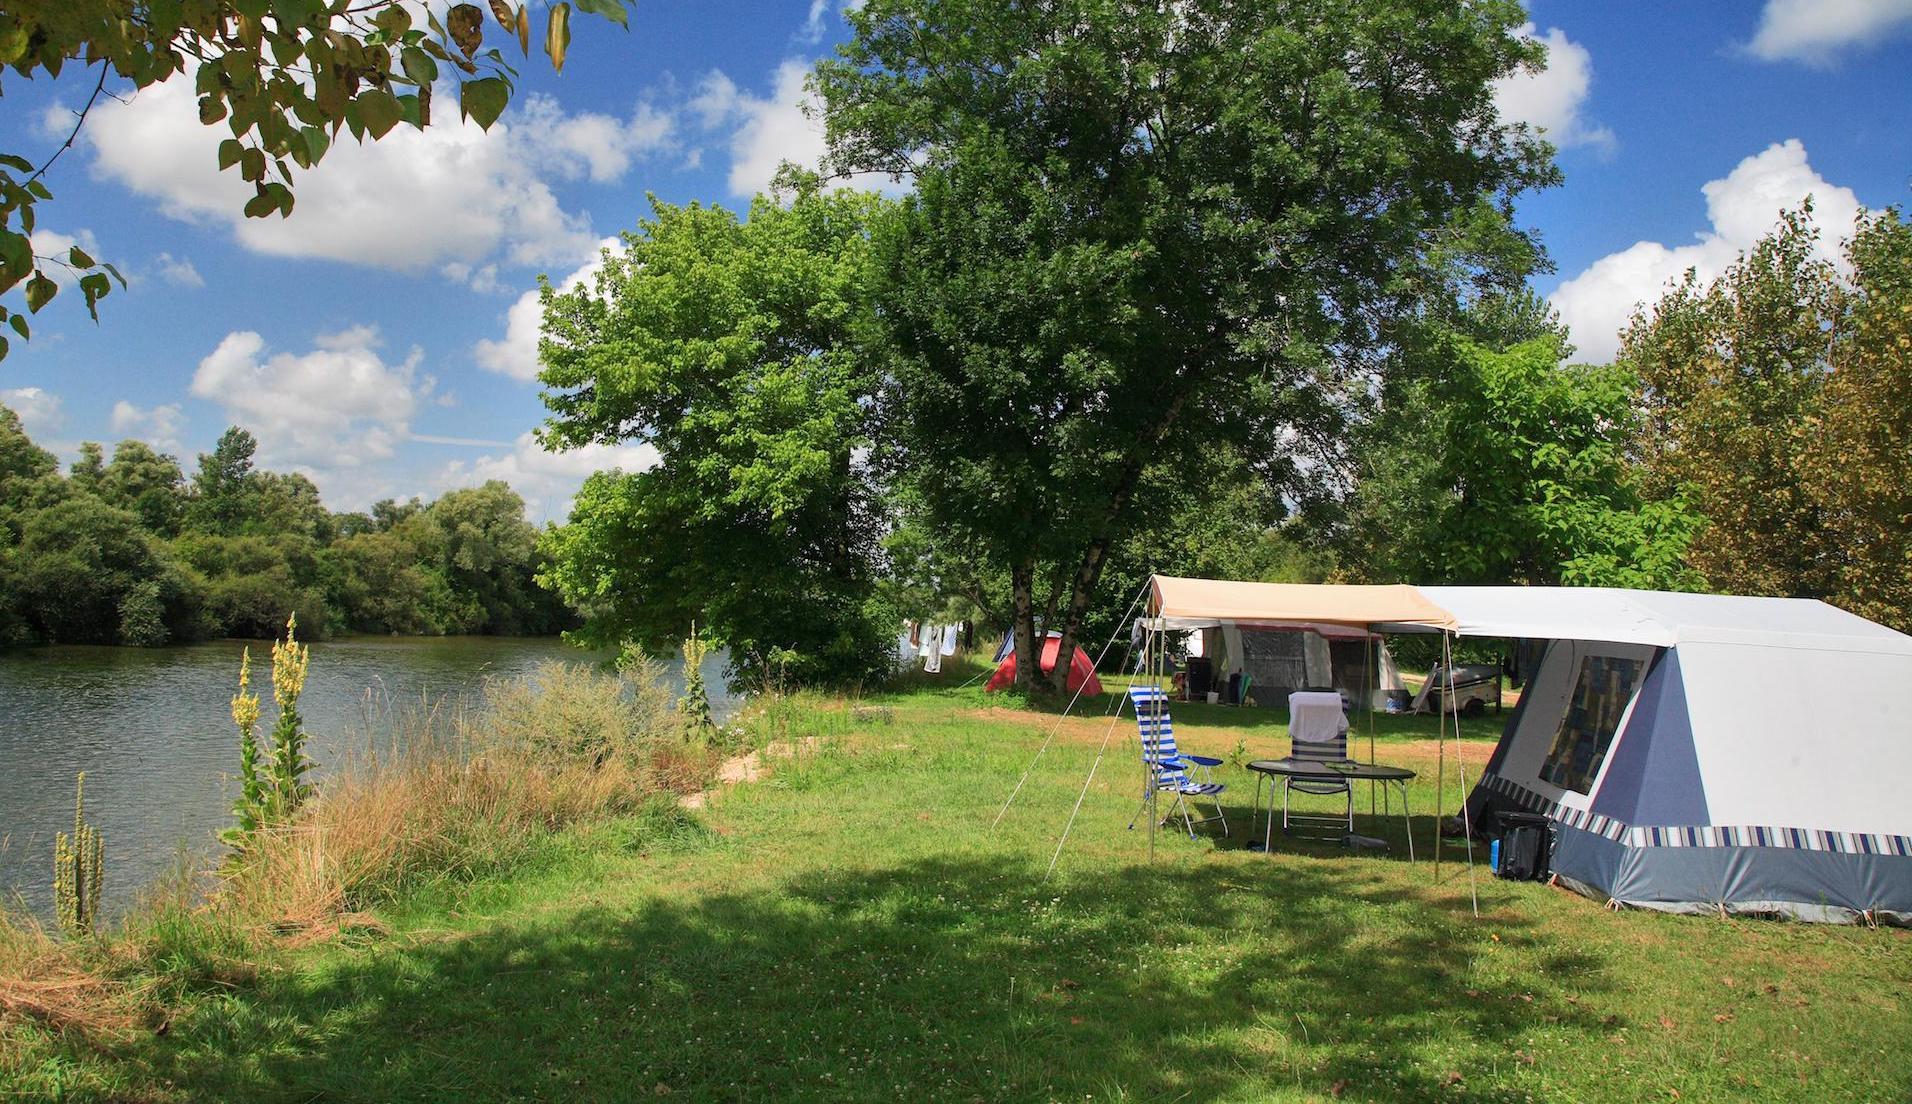 Riverside Camping in France - The best riverside campsites in France